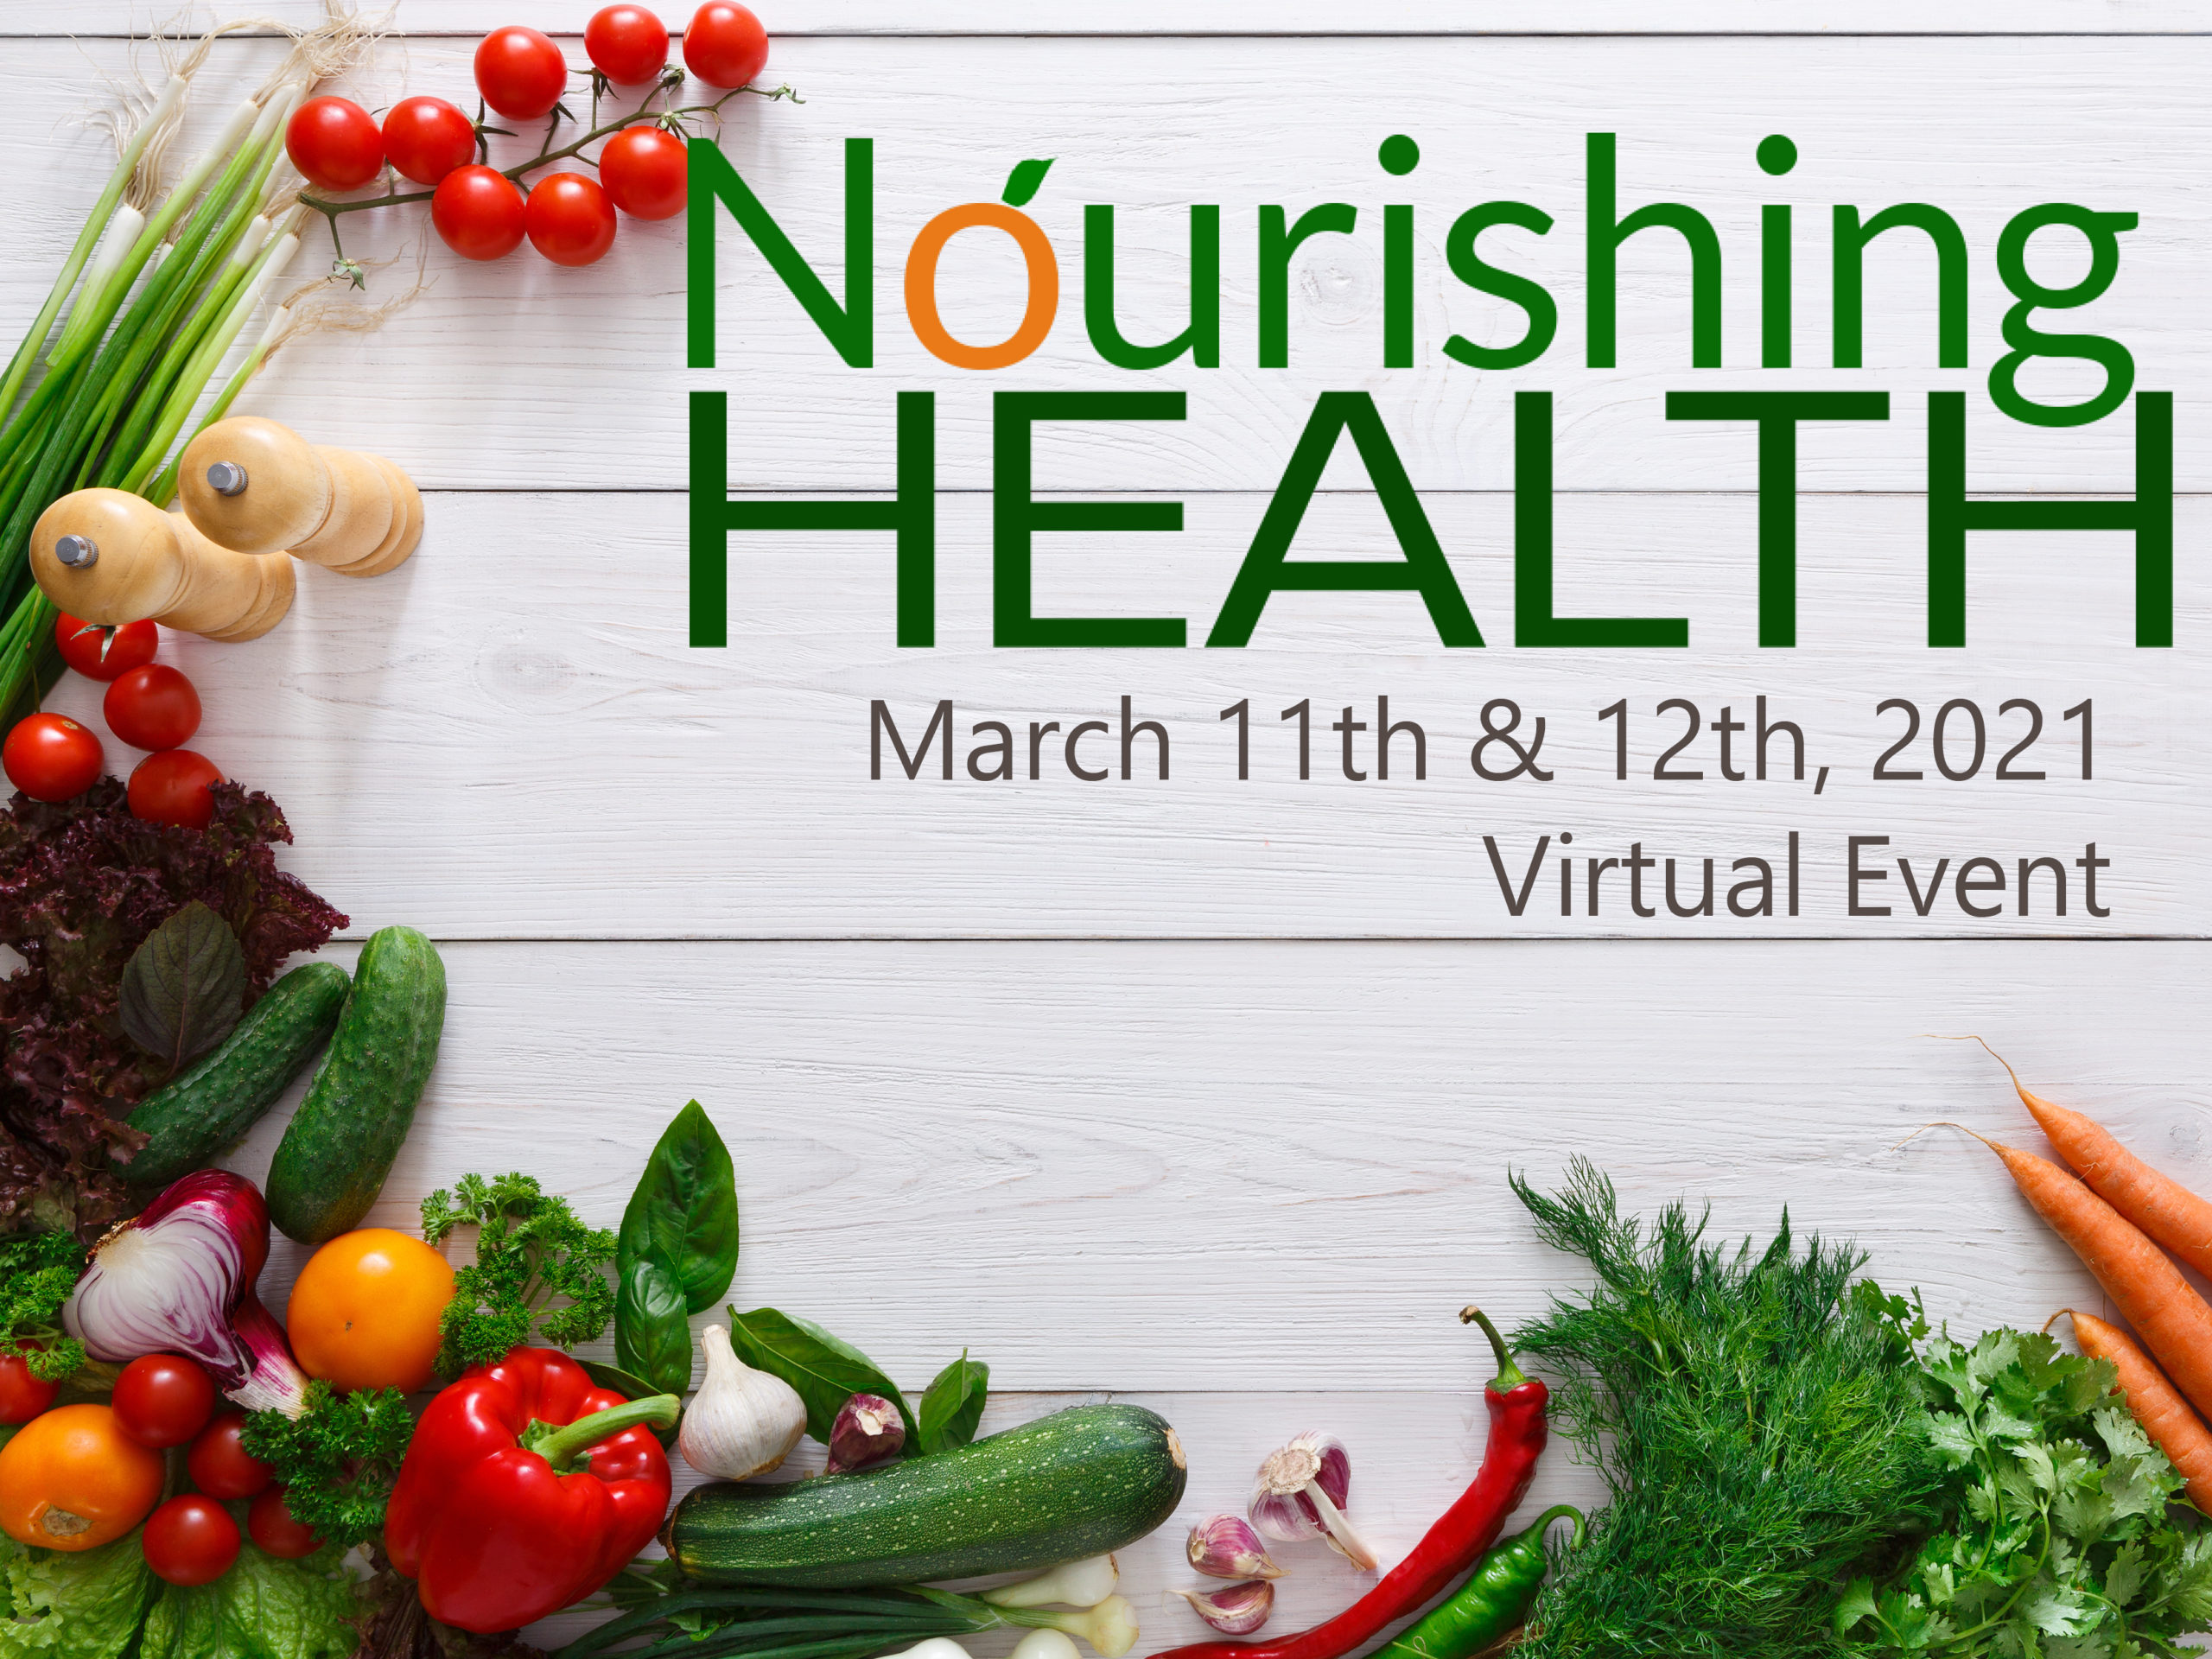 2021 'Nourishing Health' Symposium & Expo